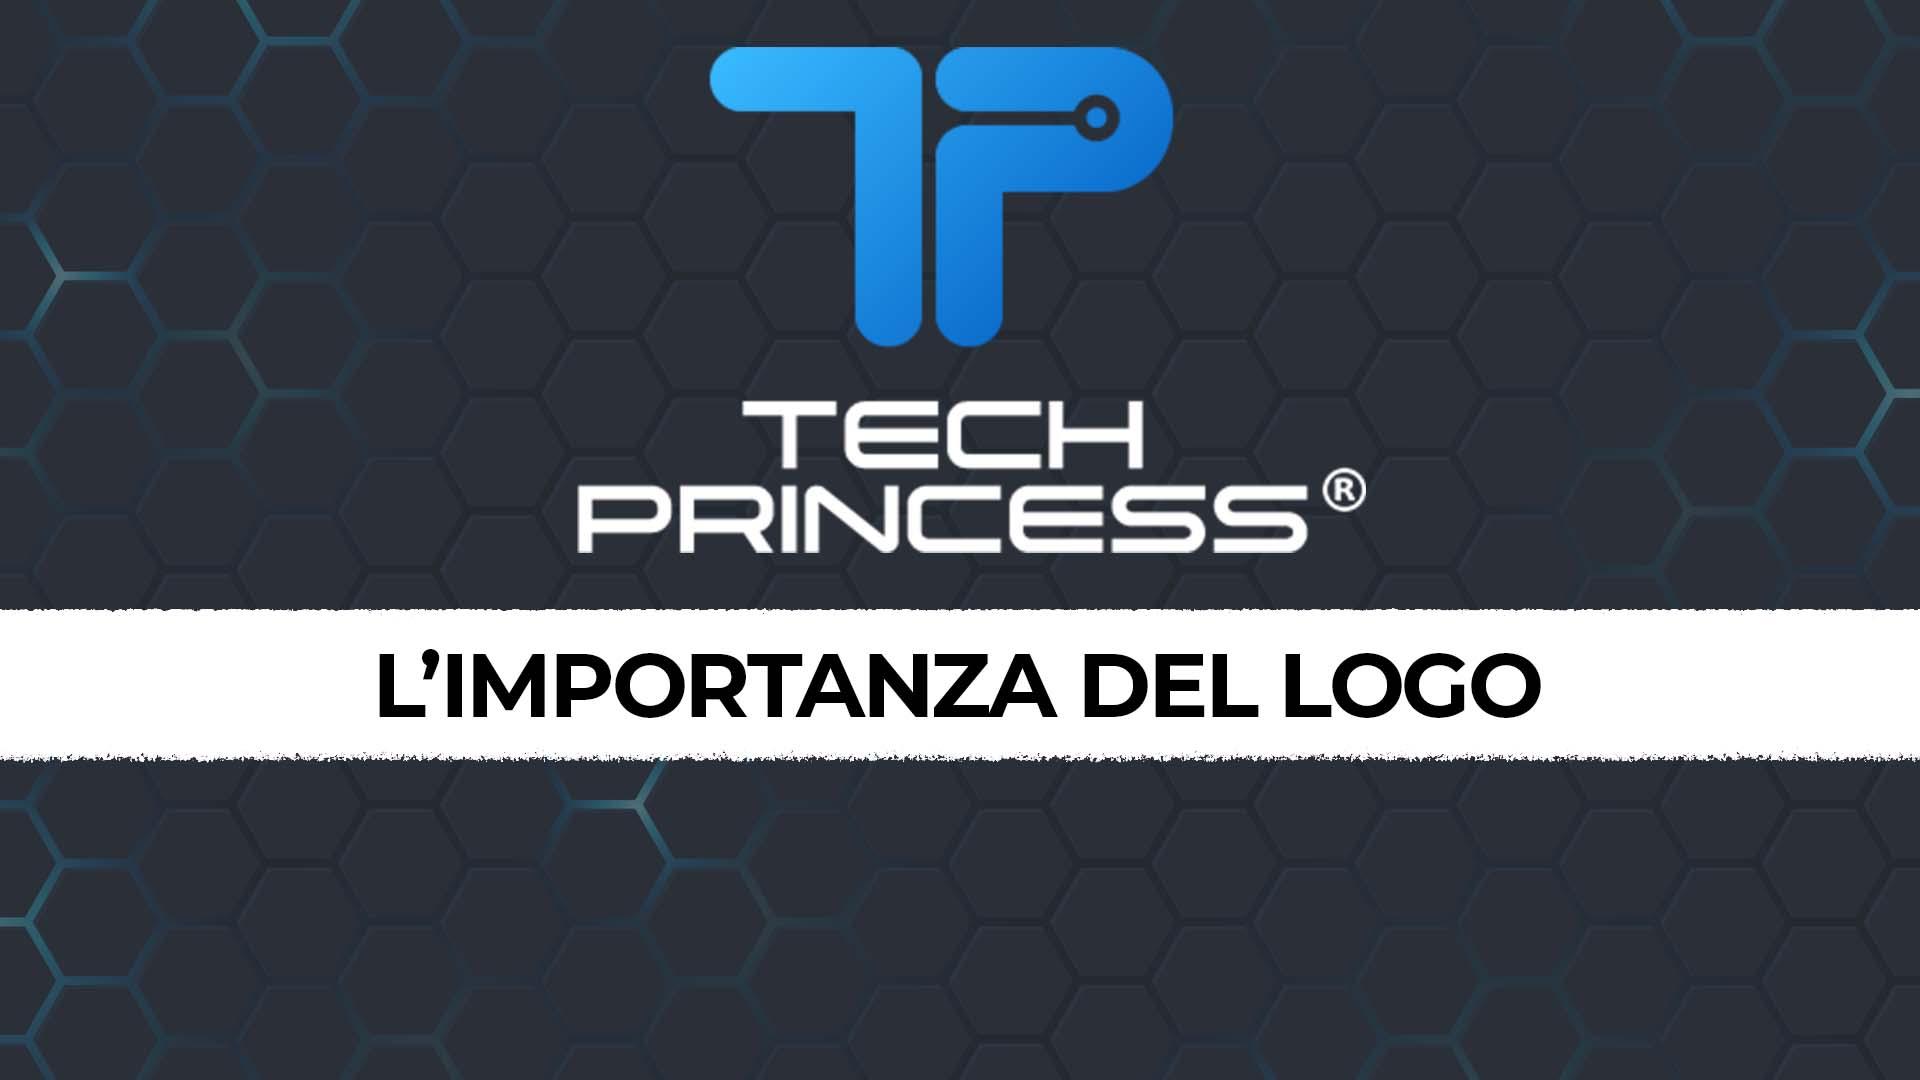 Presentiamoci con il giusto logo thumbnail